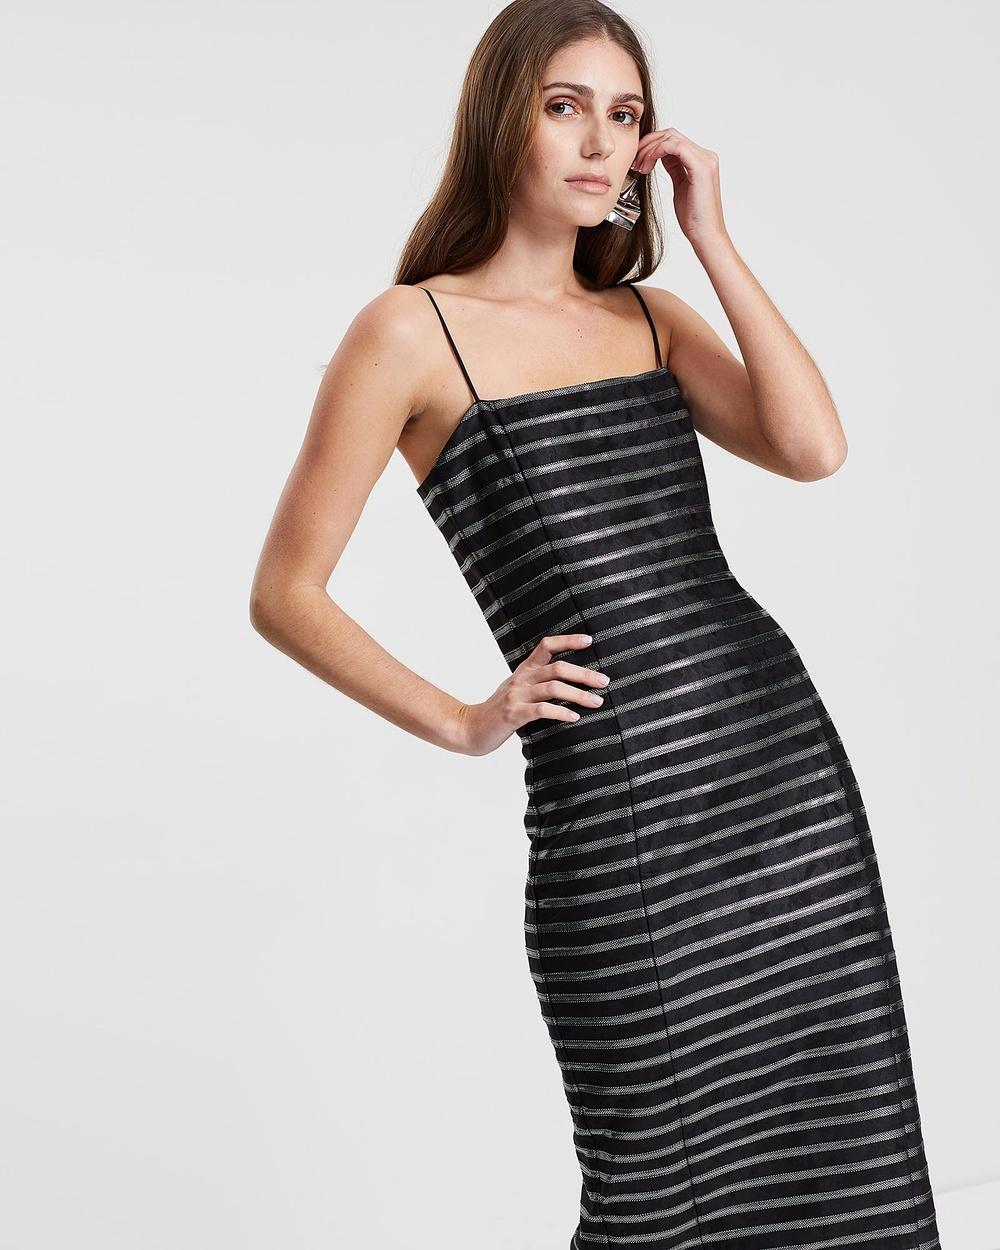 Eliya The Label Black Amalie Dress